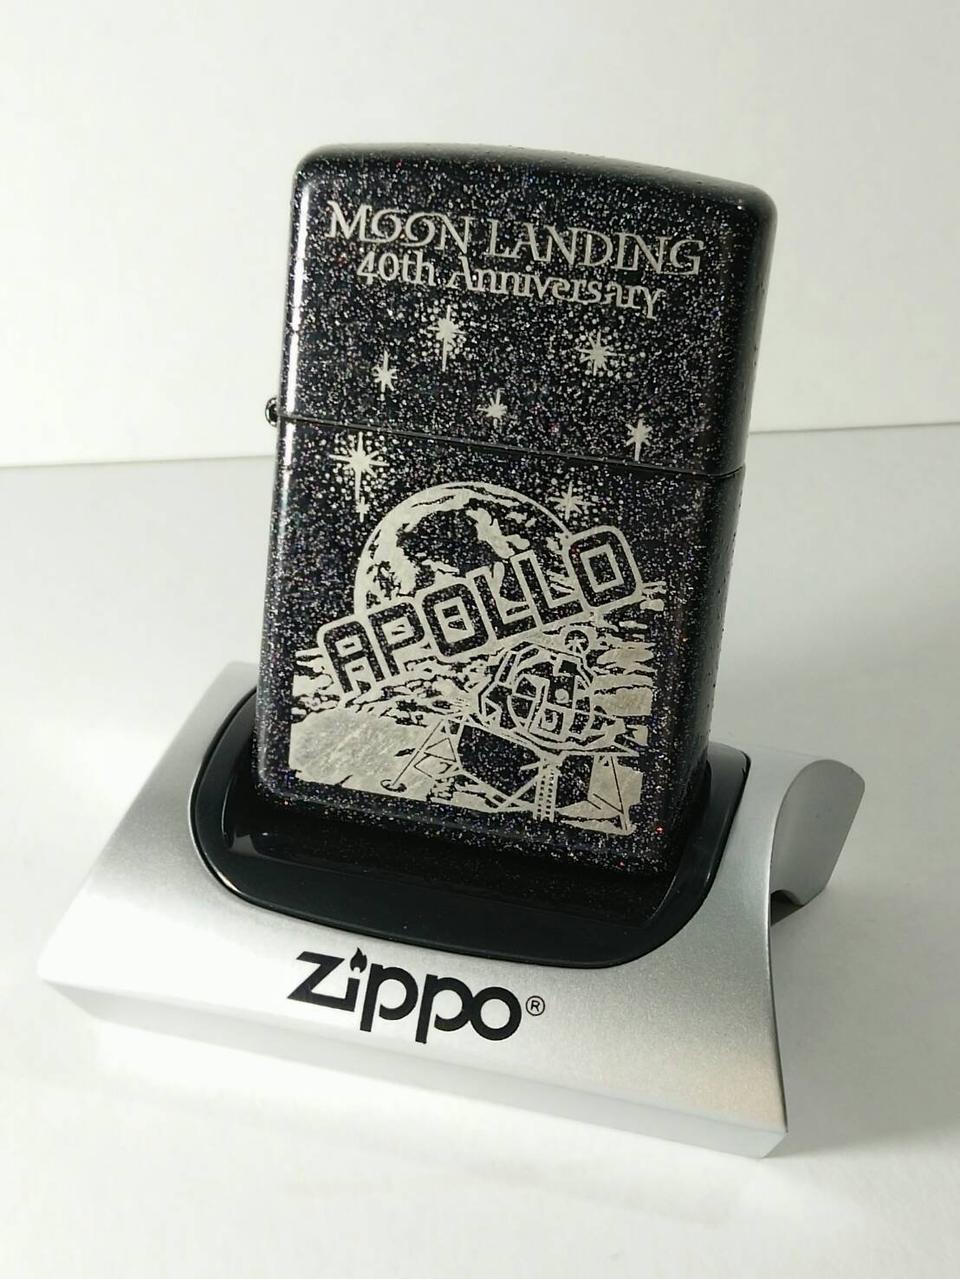 ZIPPO Moon Landing 40th Anniversary Apollo รูปที่ 1